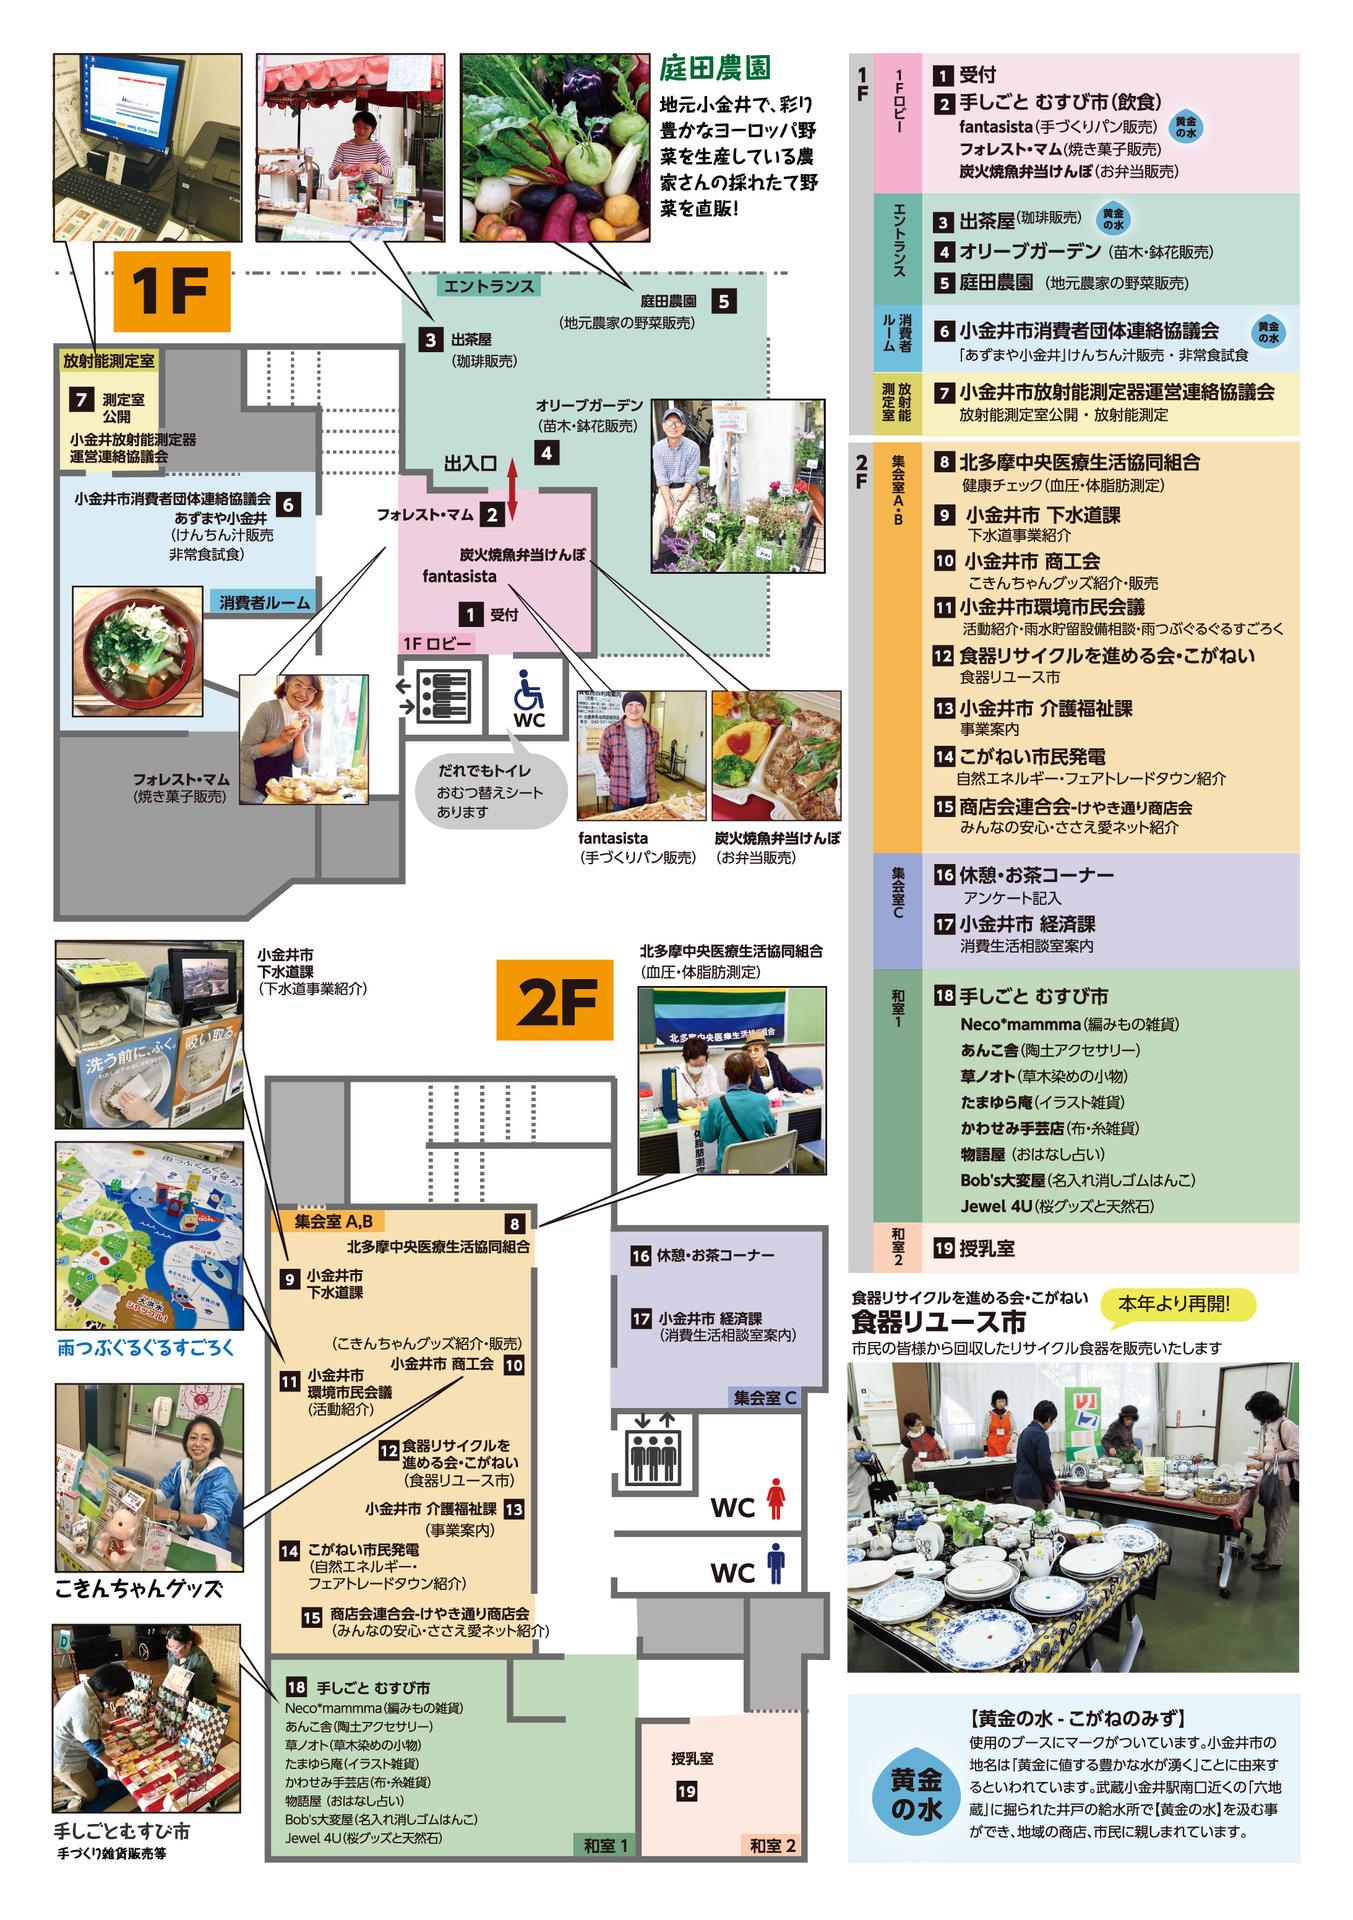 marche2019_chirashi_ura1005_OL_WEB.jpg